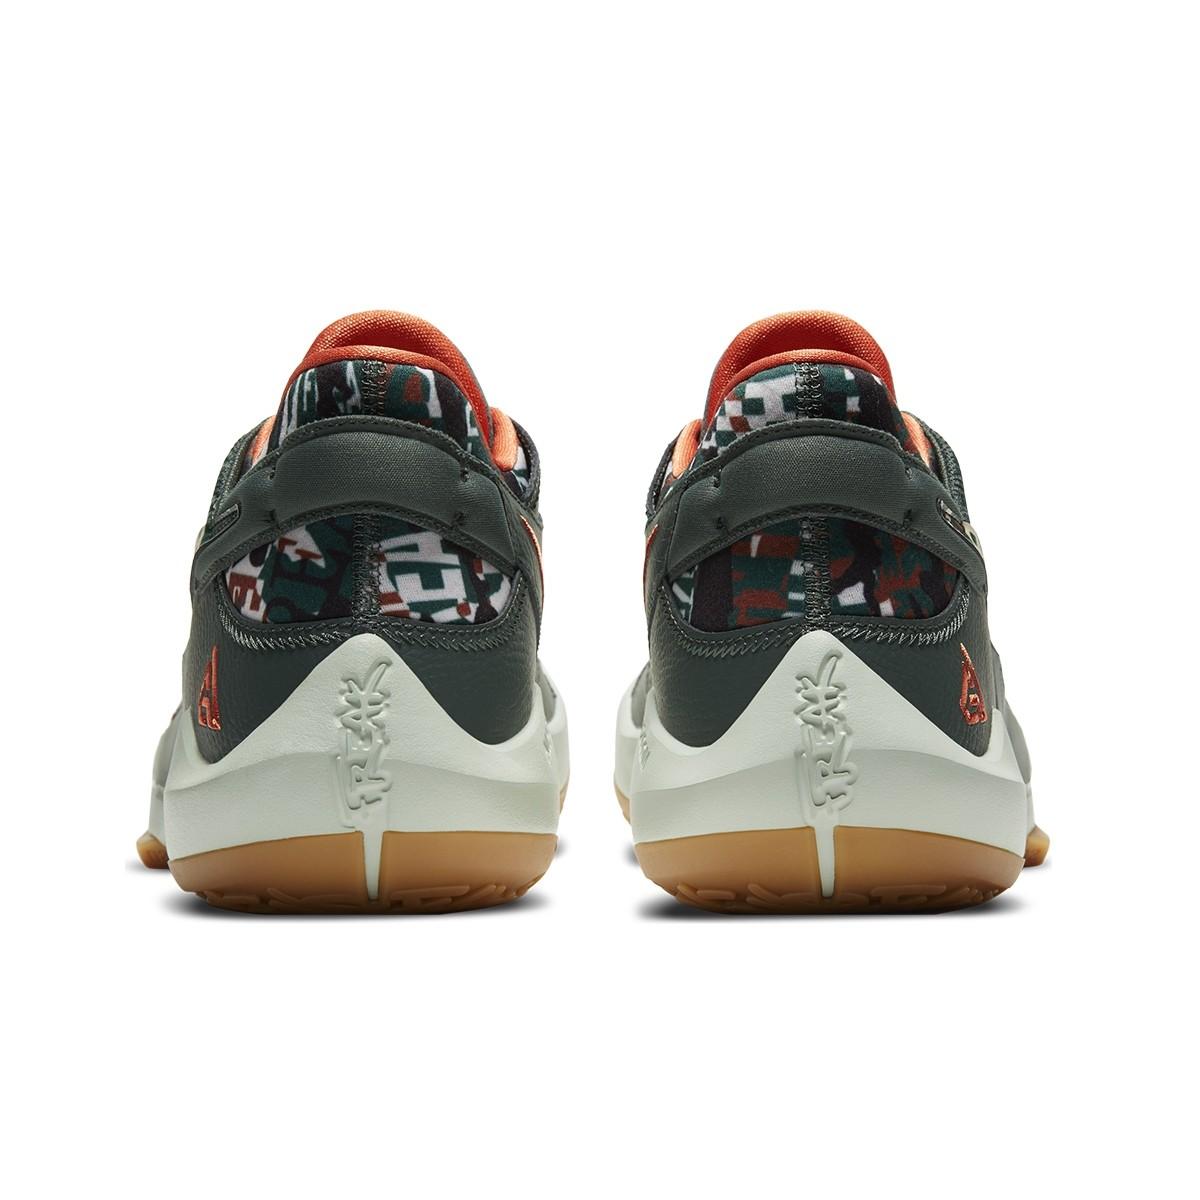 Nike Zoom Freak 2 'Bamo'-DC9853-300